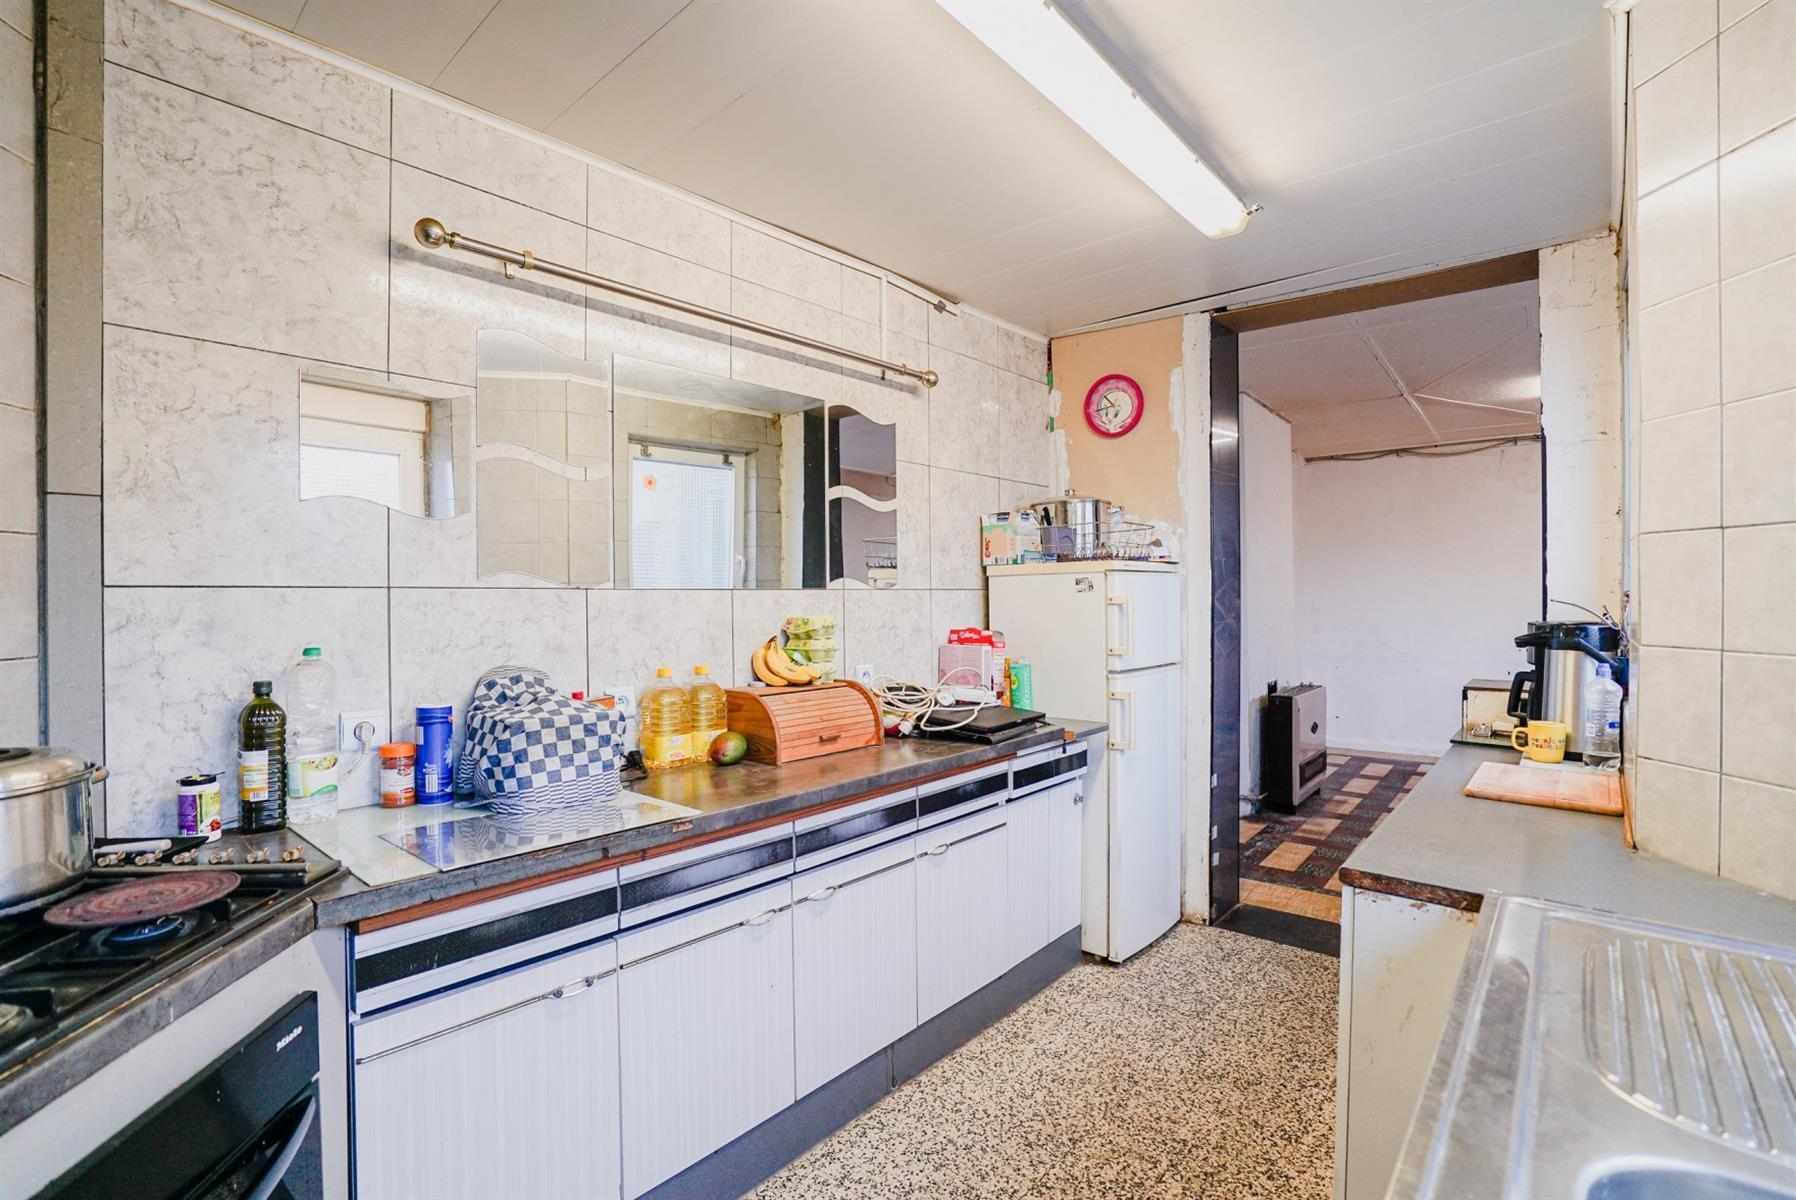 Maison - Oupeye Hermallesous-Argenteau - #4324098-5